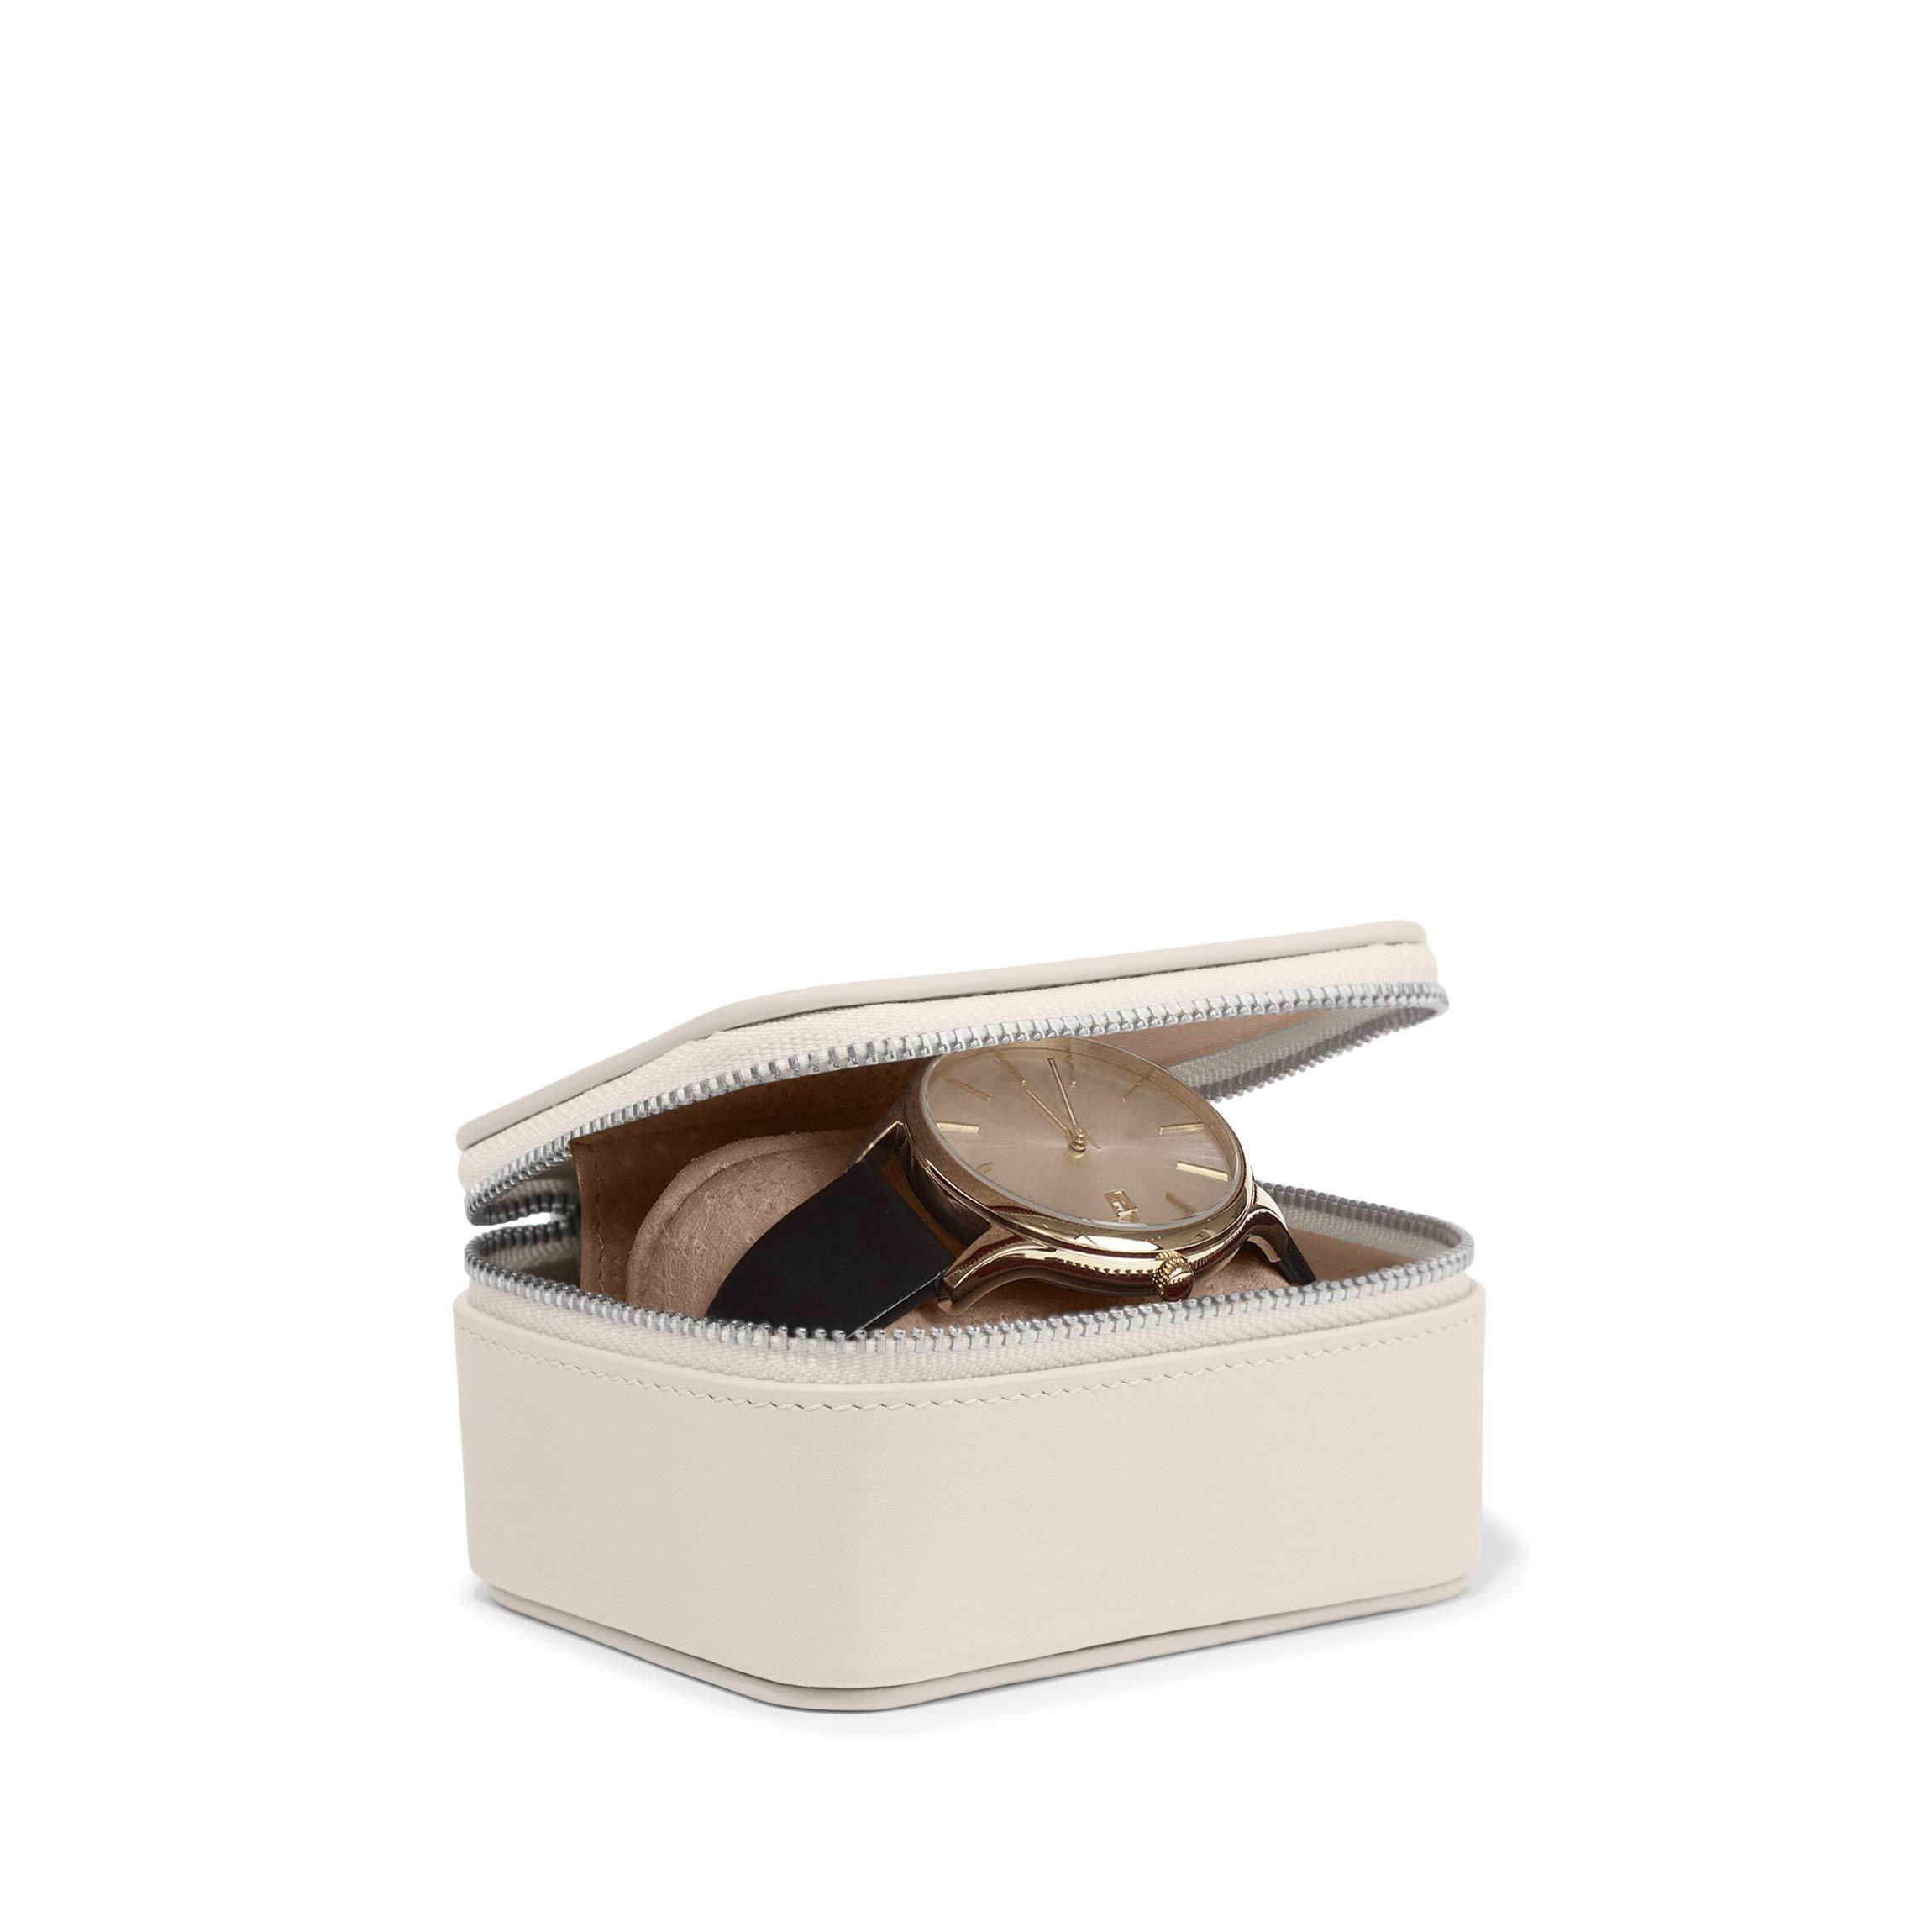 Leatherology Ivory Travel Watch Box by Leatherology